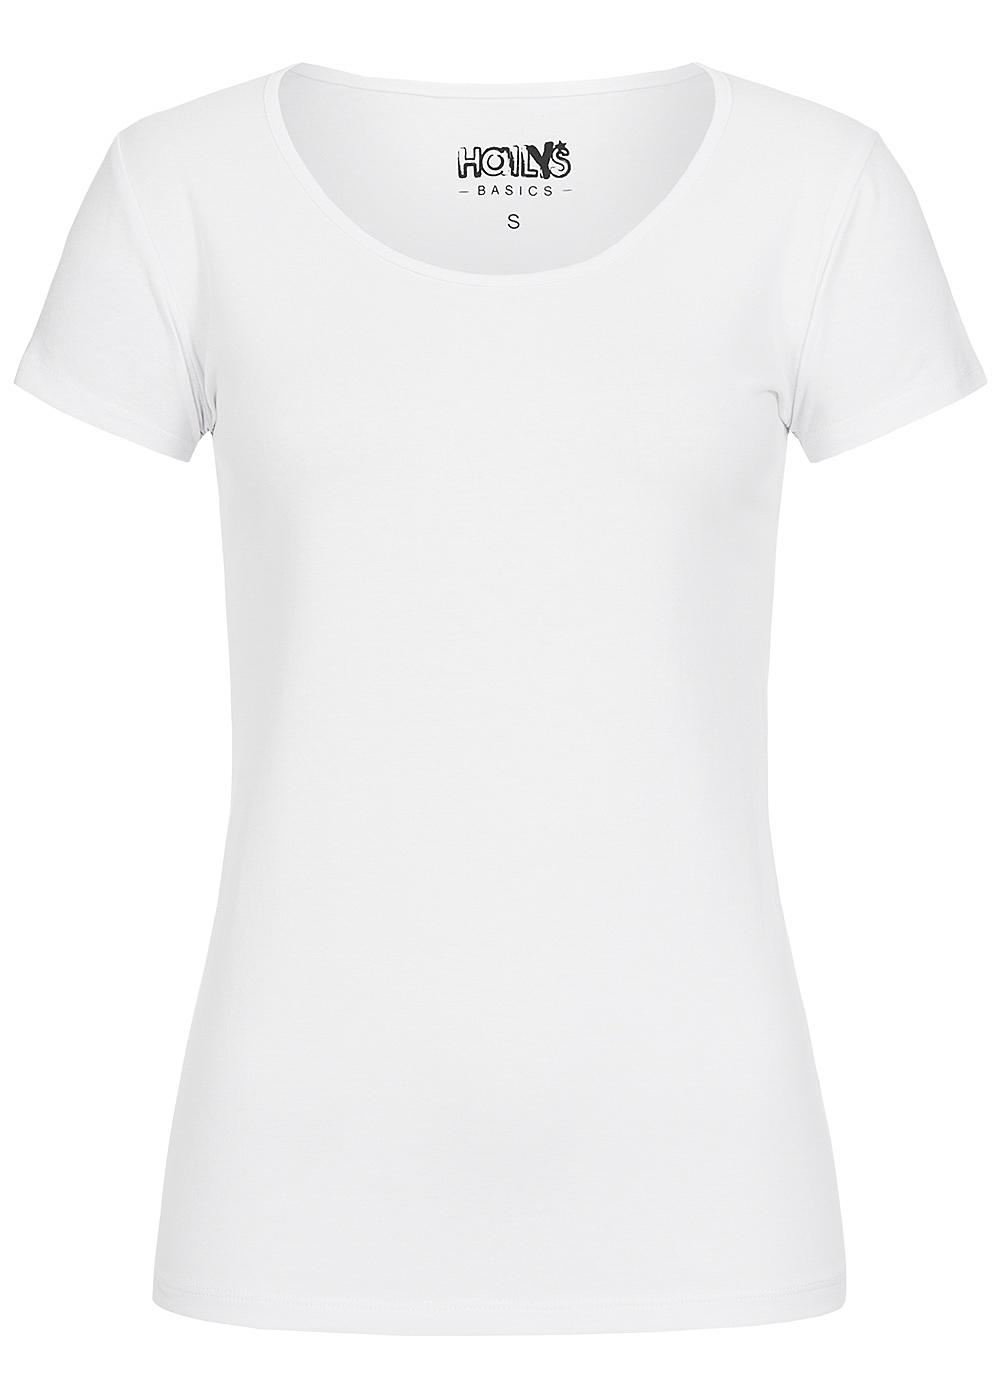 hailys damen basic t shirt kurzarm weiss 77onlineshop. Black Bedroom Furniture Sets. Home Design Ideas